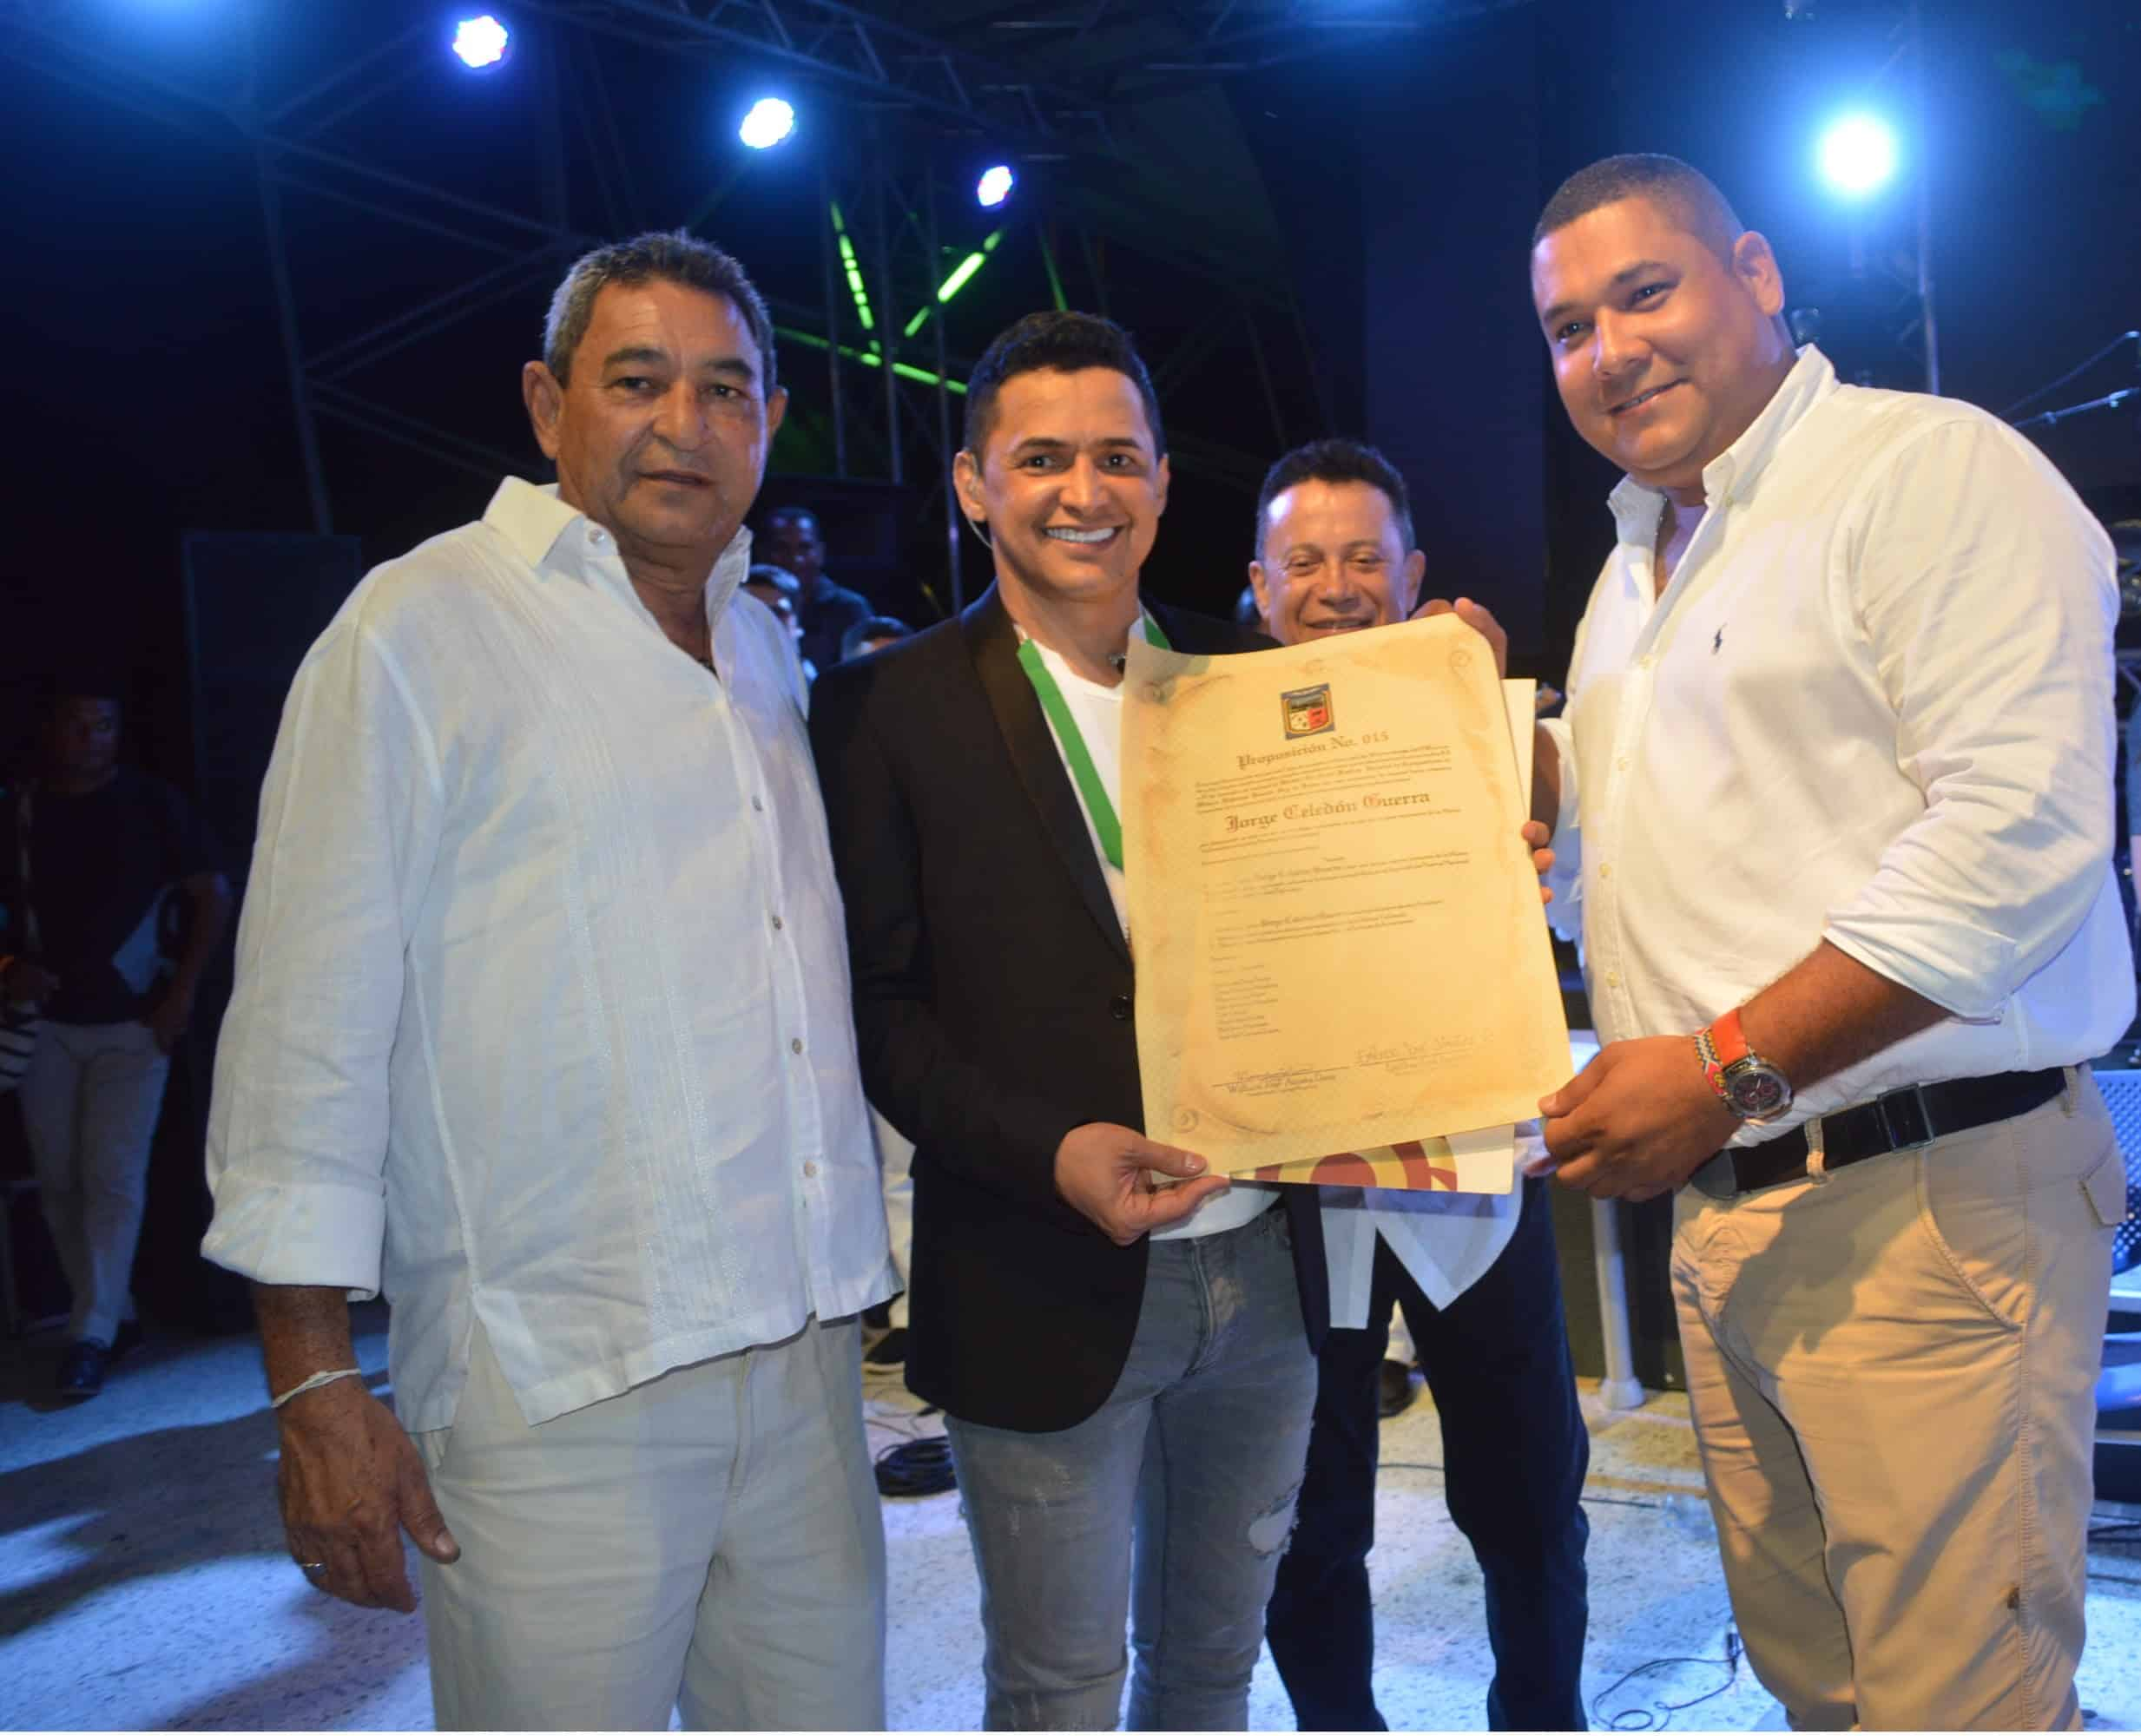 Jorge Celedón declarado 'Hijo Adoptivo' de San Juan del Cesar - Guajira